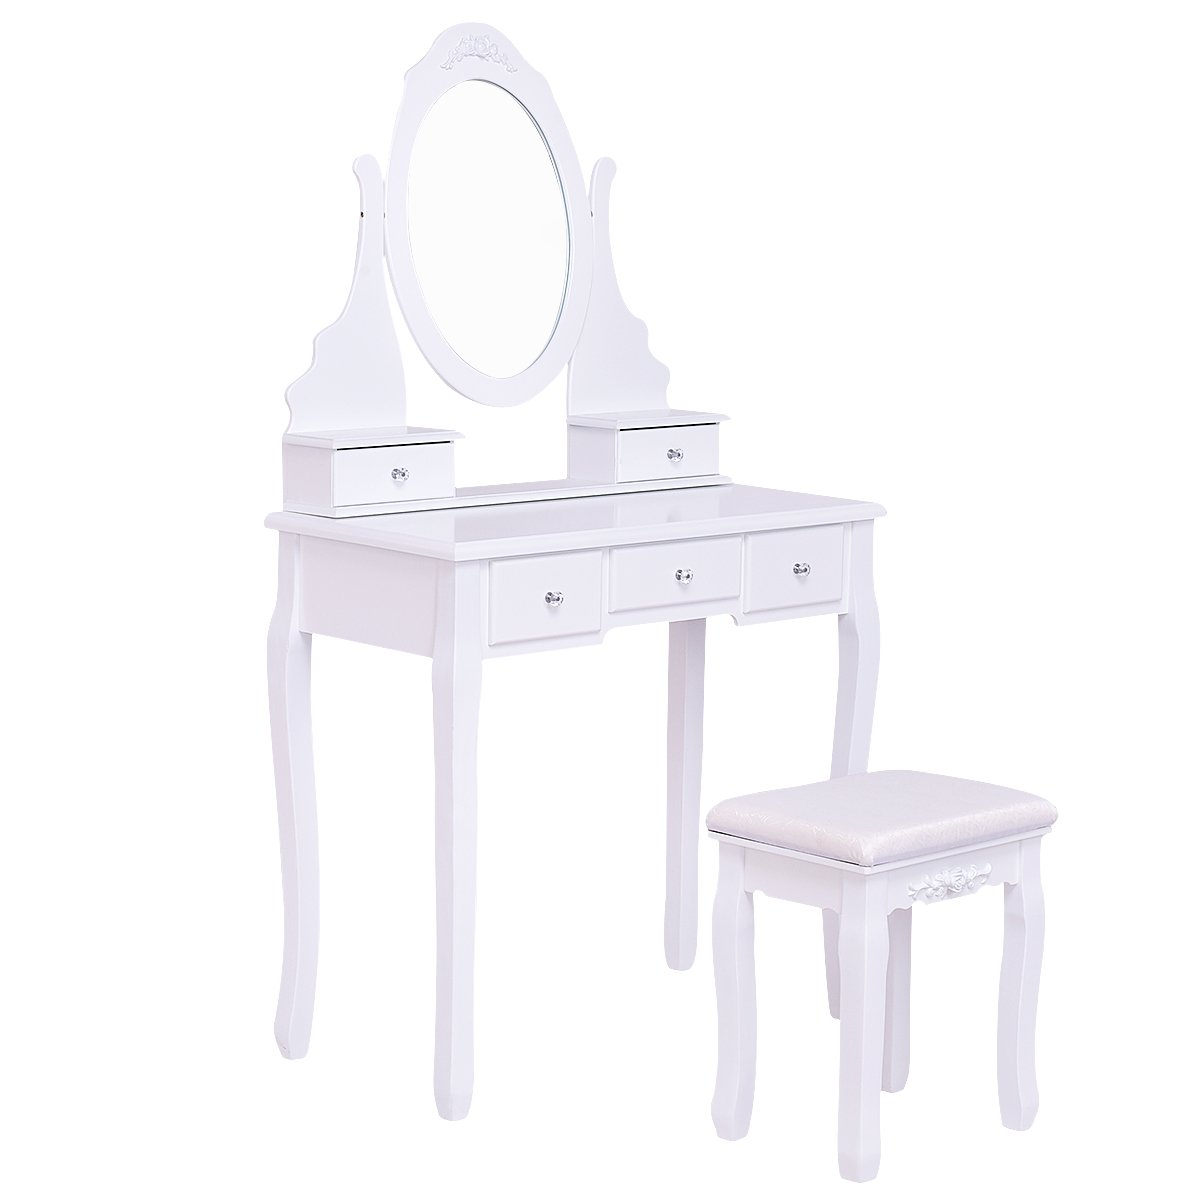 Giantex White Bathroom Vanity Dressing Table Set Mirror with Stool (Round Mirror 5 Drawers)